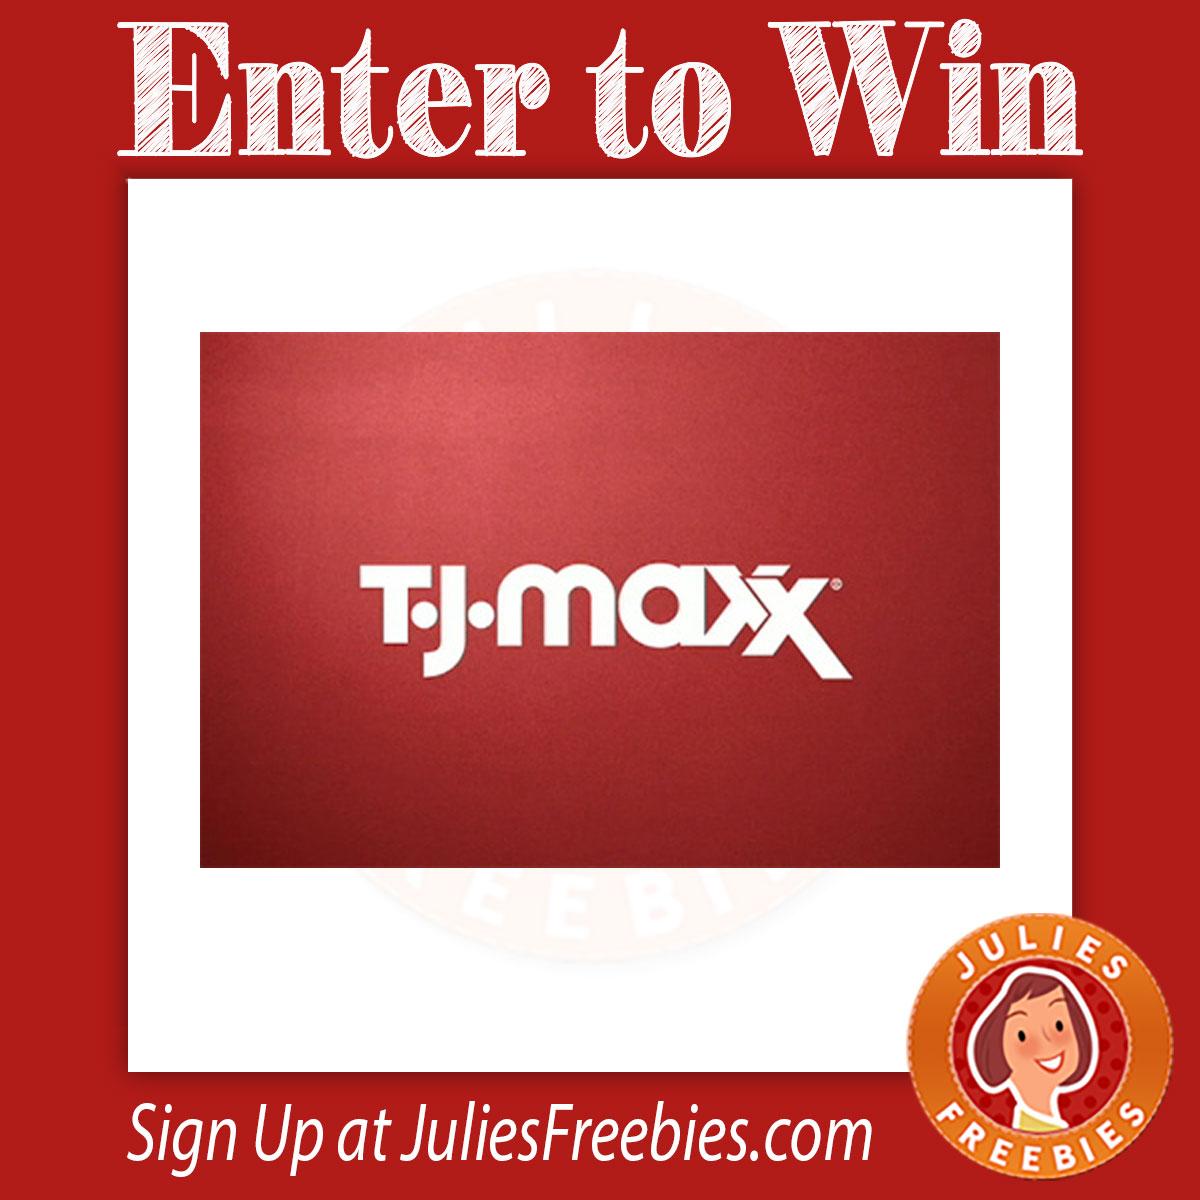 Maxx Flash Birthday Bash Sweepstakes - Julie's Freebies